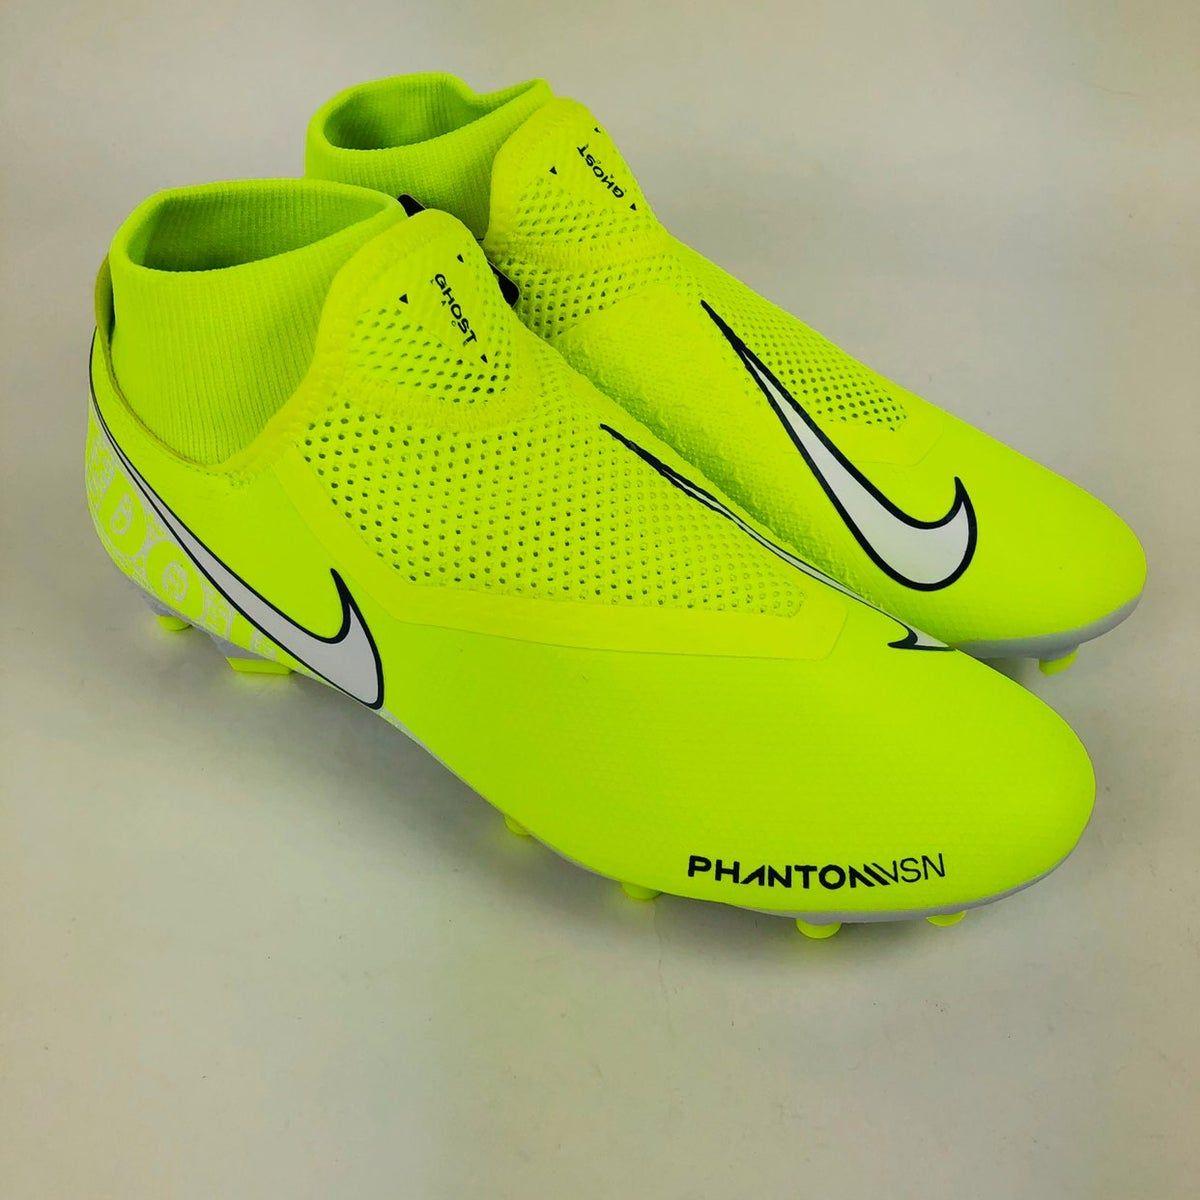 Nike Phantom VSN Academy Soccer Cleats